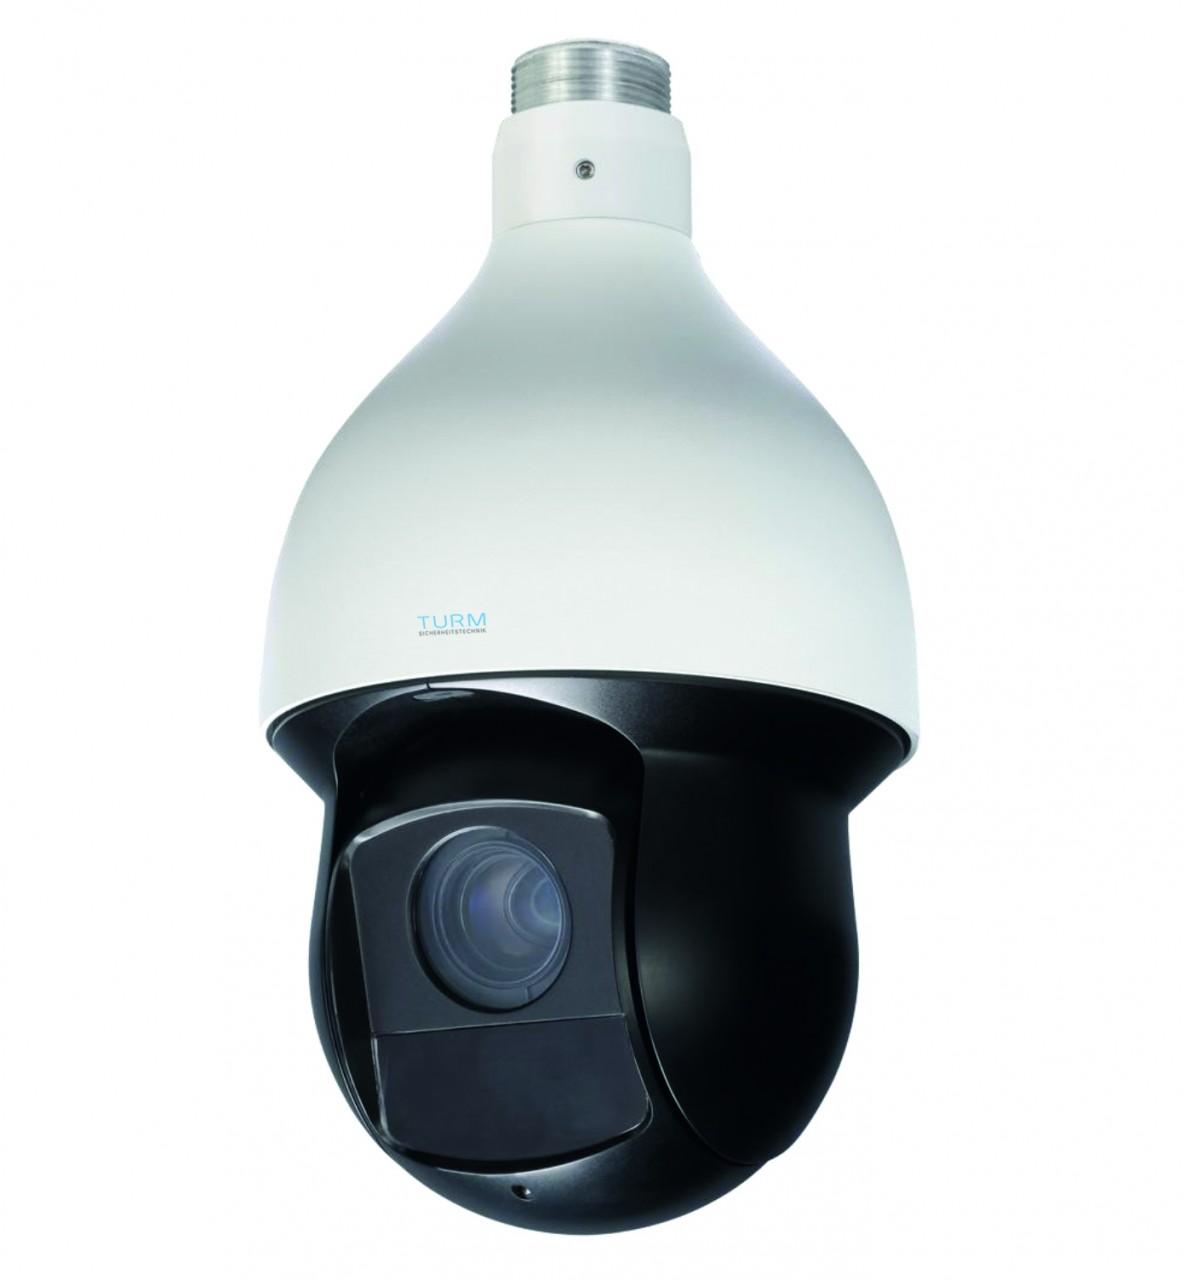 TURM HDCVI Professional 4 MP PTZ Kamera mit 30x Zoom und 100m Nachtsicht